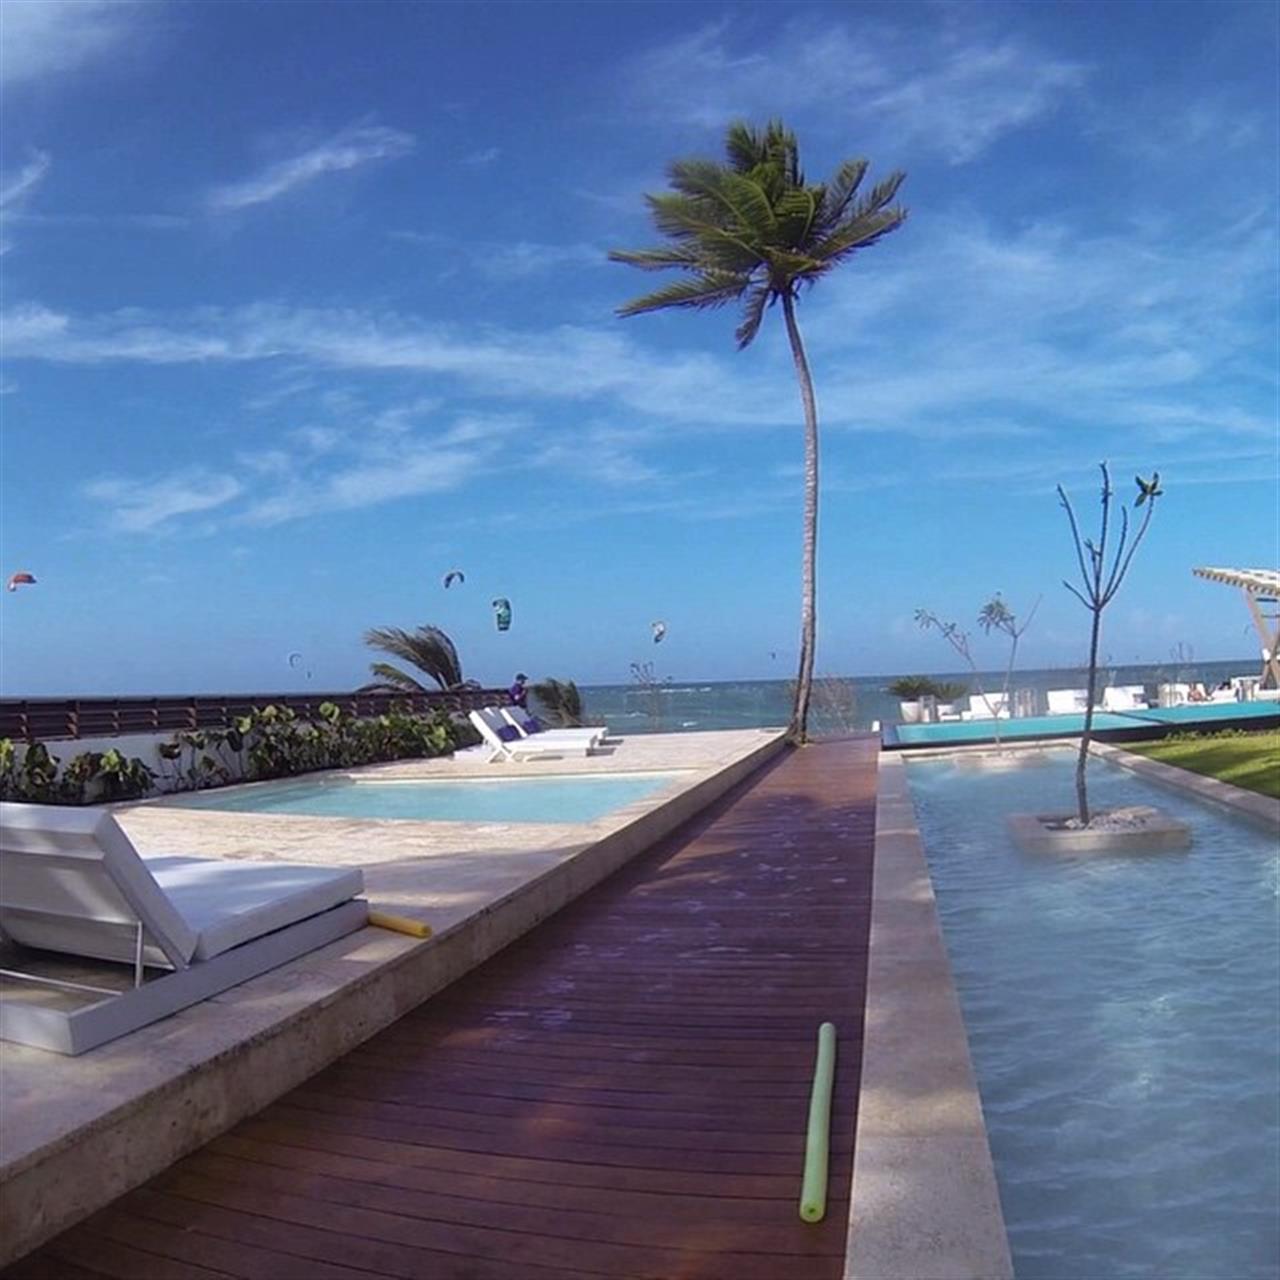 #kiteboarding #Cabarete #northcoast #beach #sand #lifestyle #condos #pool #DominicanRepublic